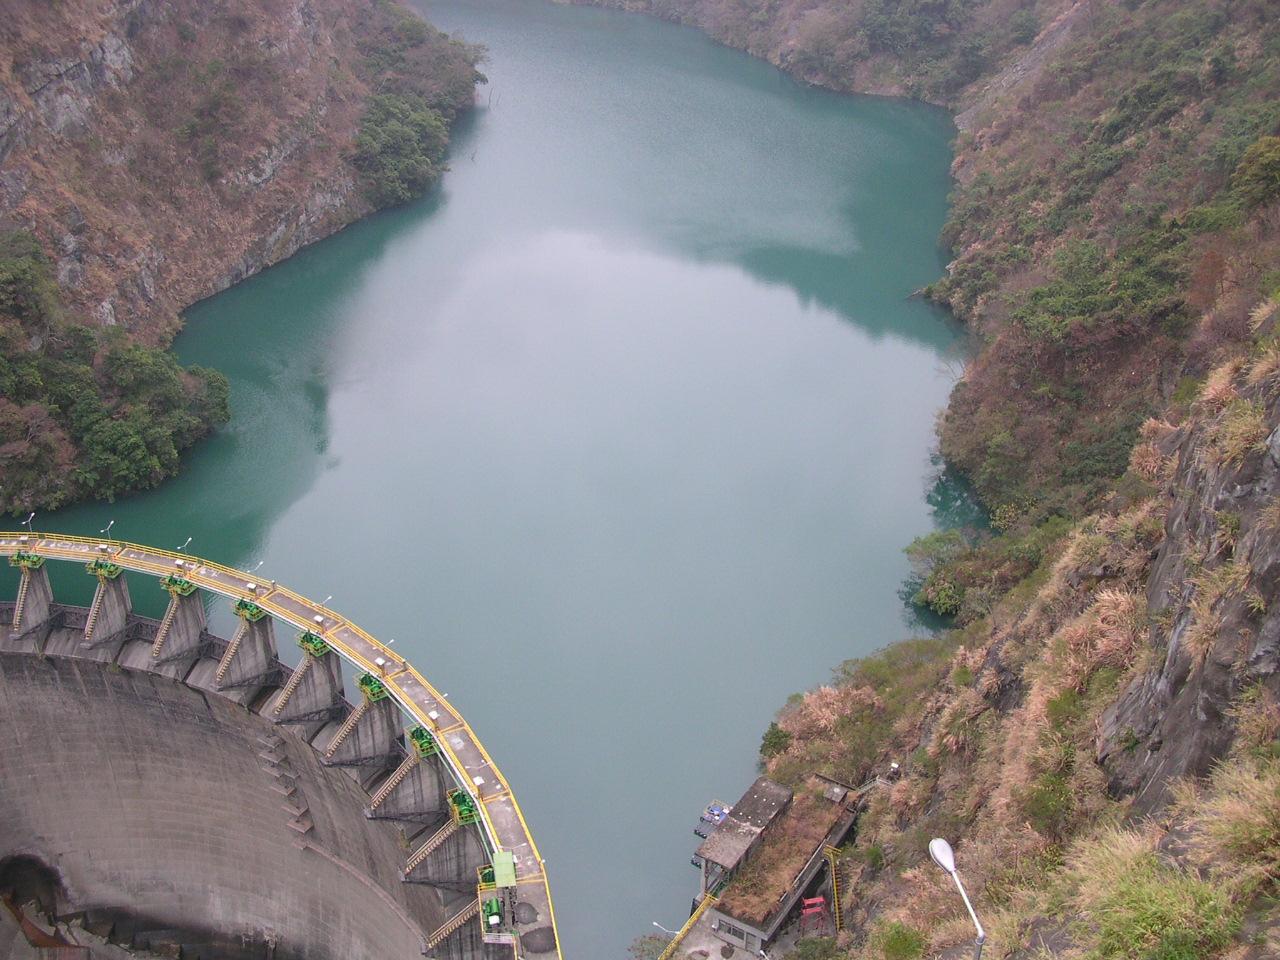 http://upload.wikimedia.org/wikipedia/commons/e/e0/Taiwan_JungHua_Dam.JPG